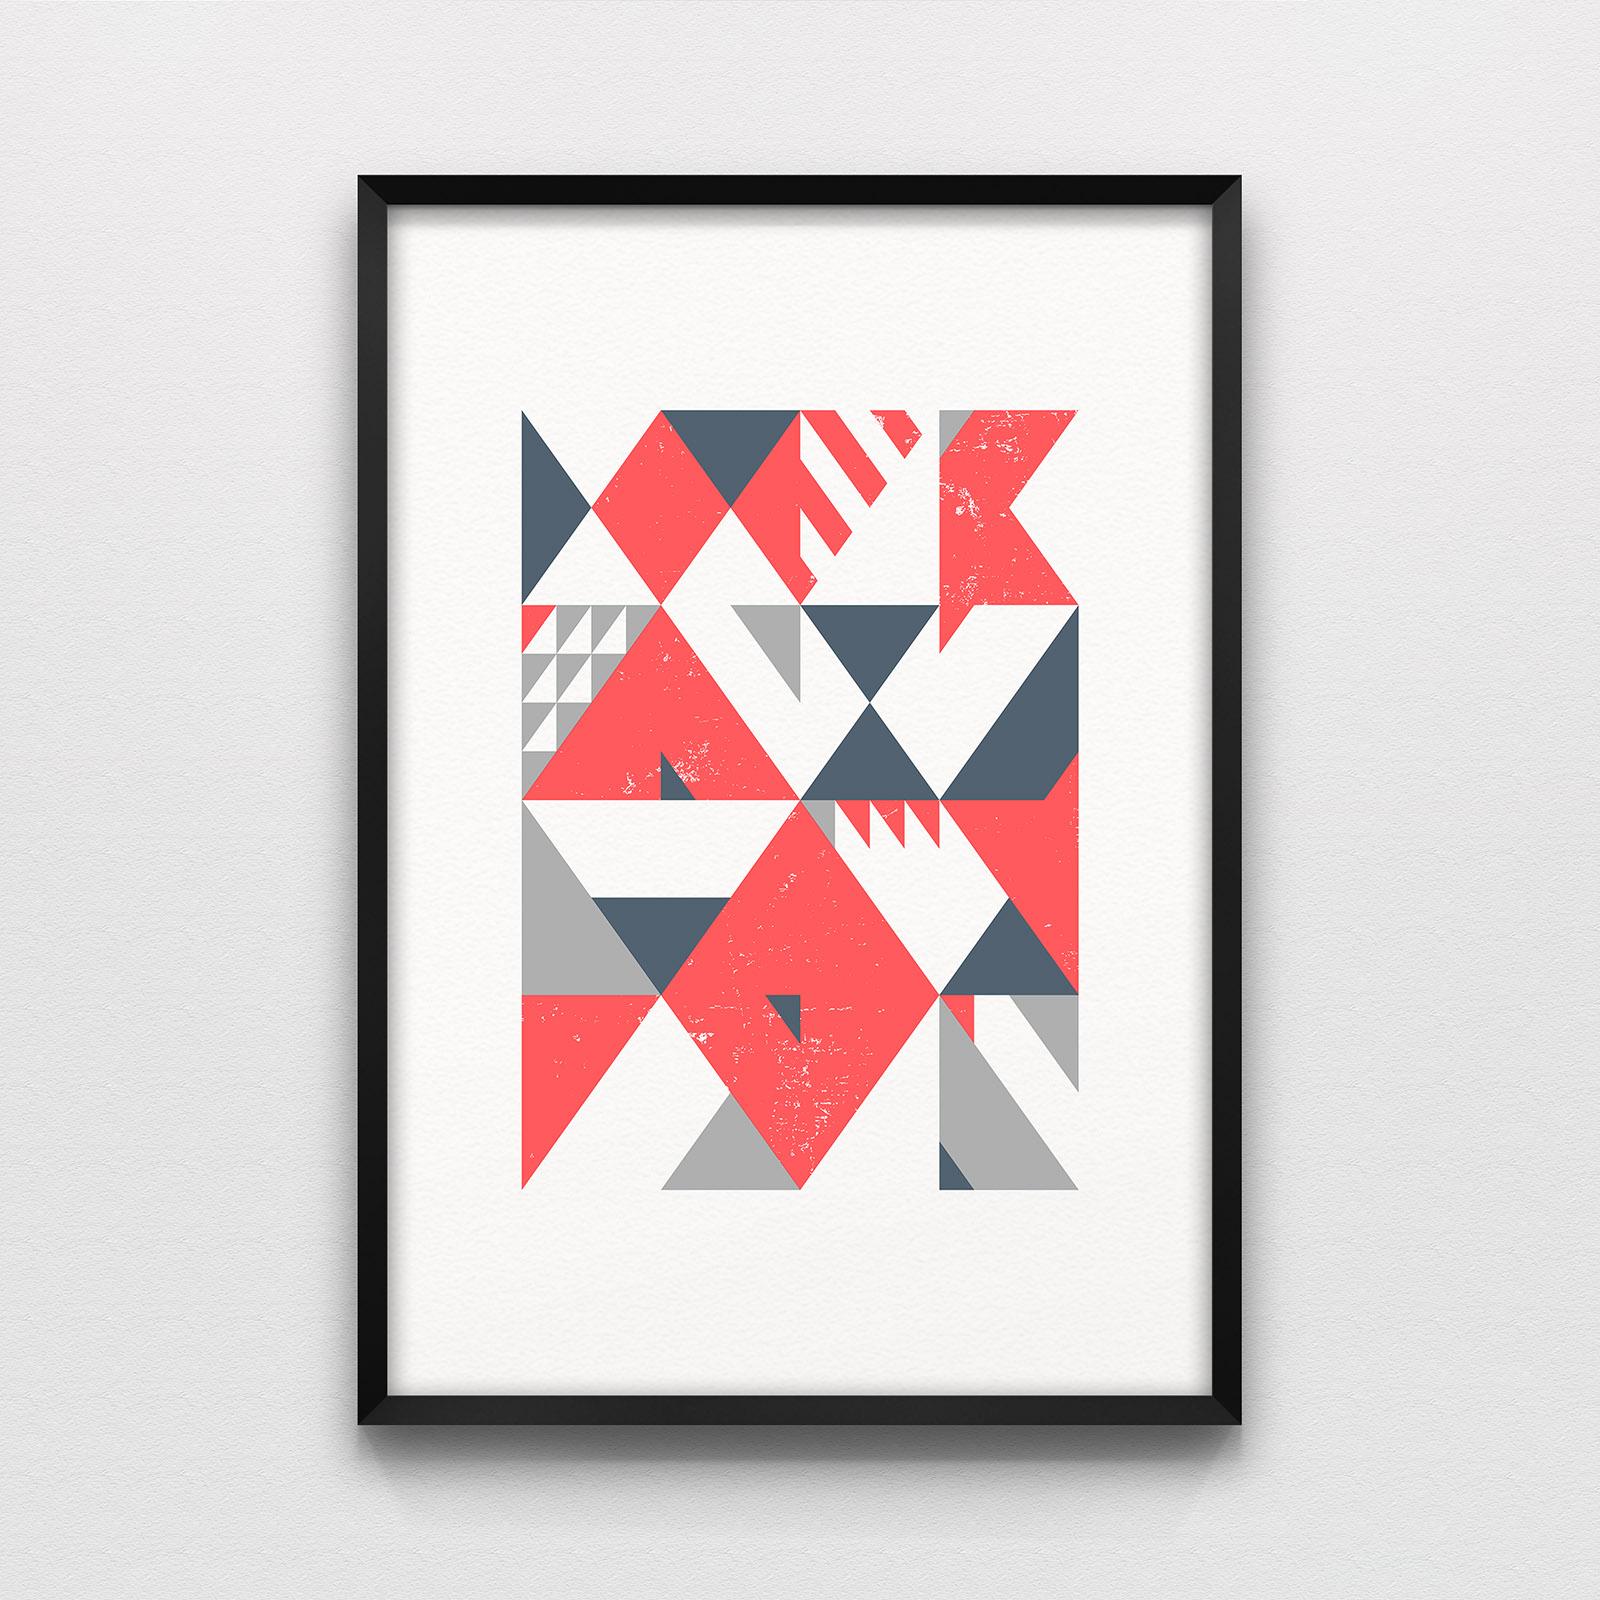 Algebra #1, 50 x 35 cm